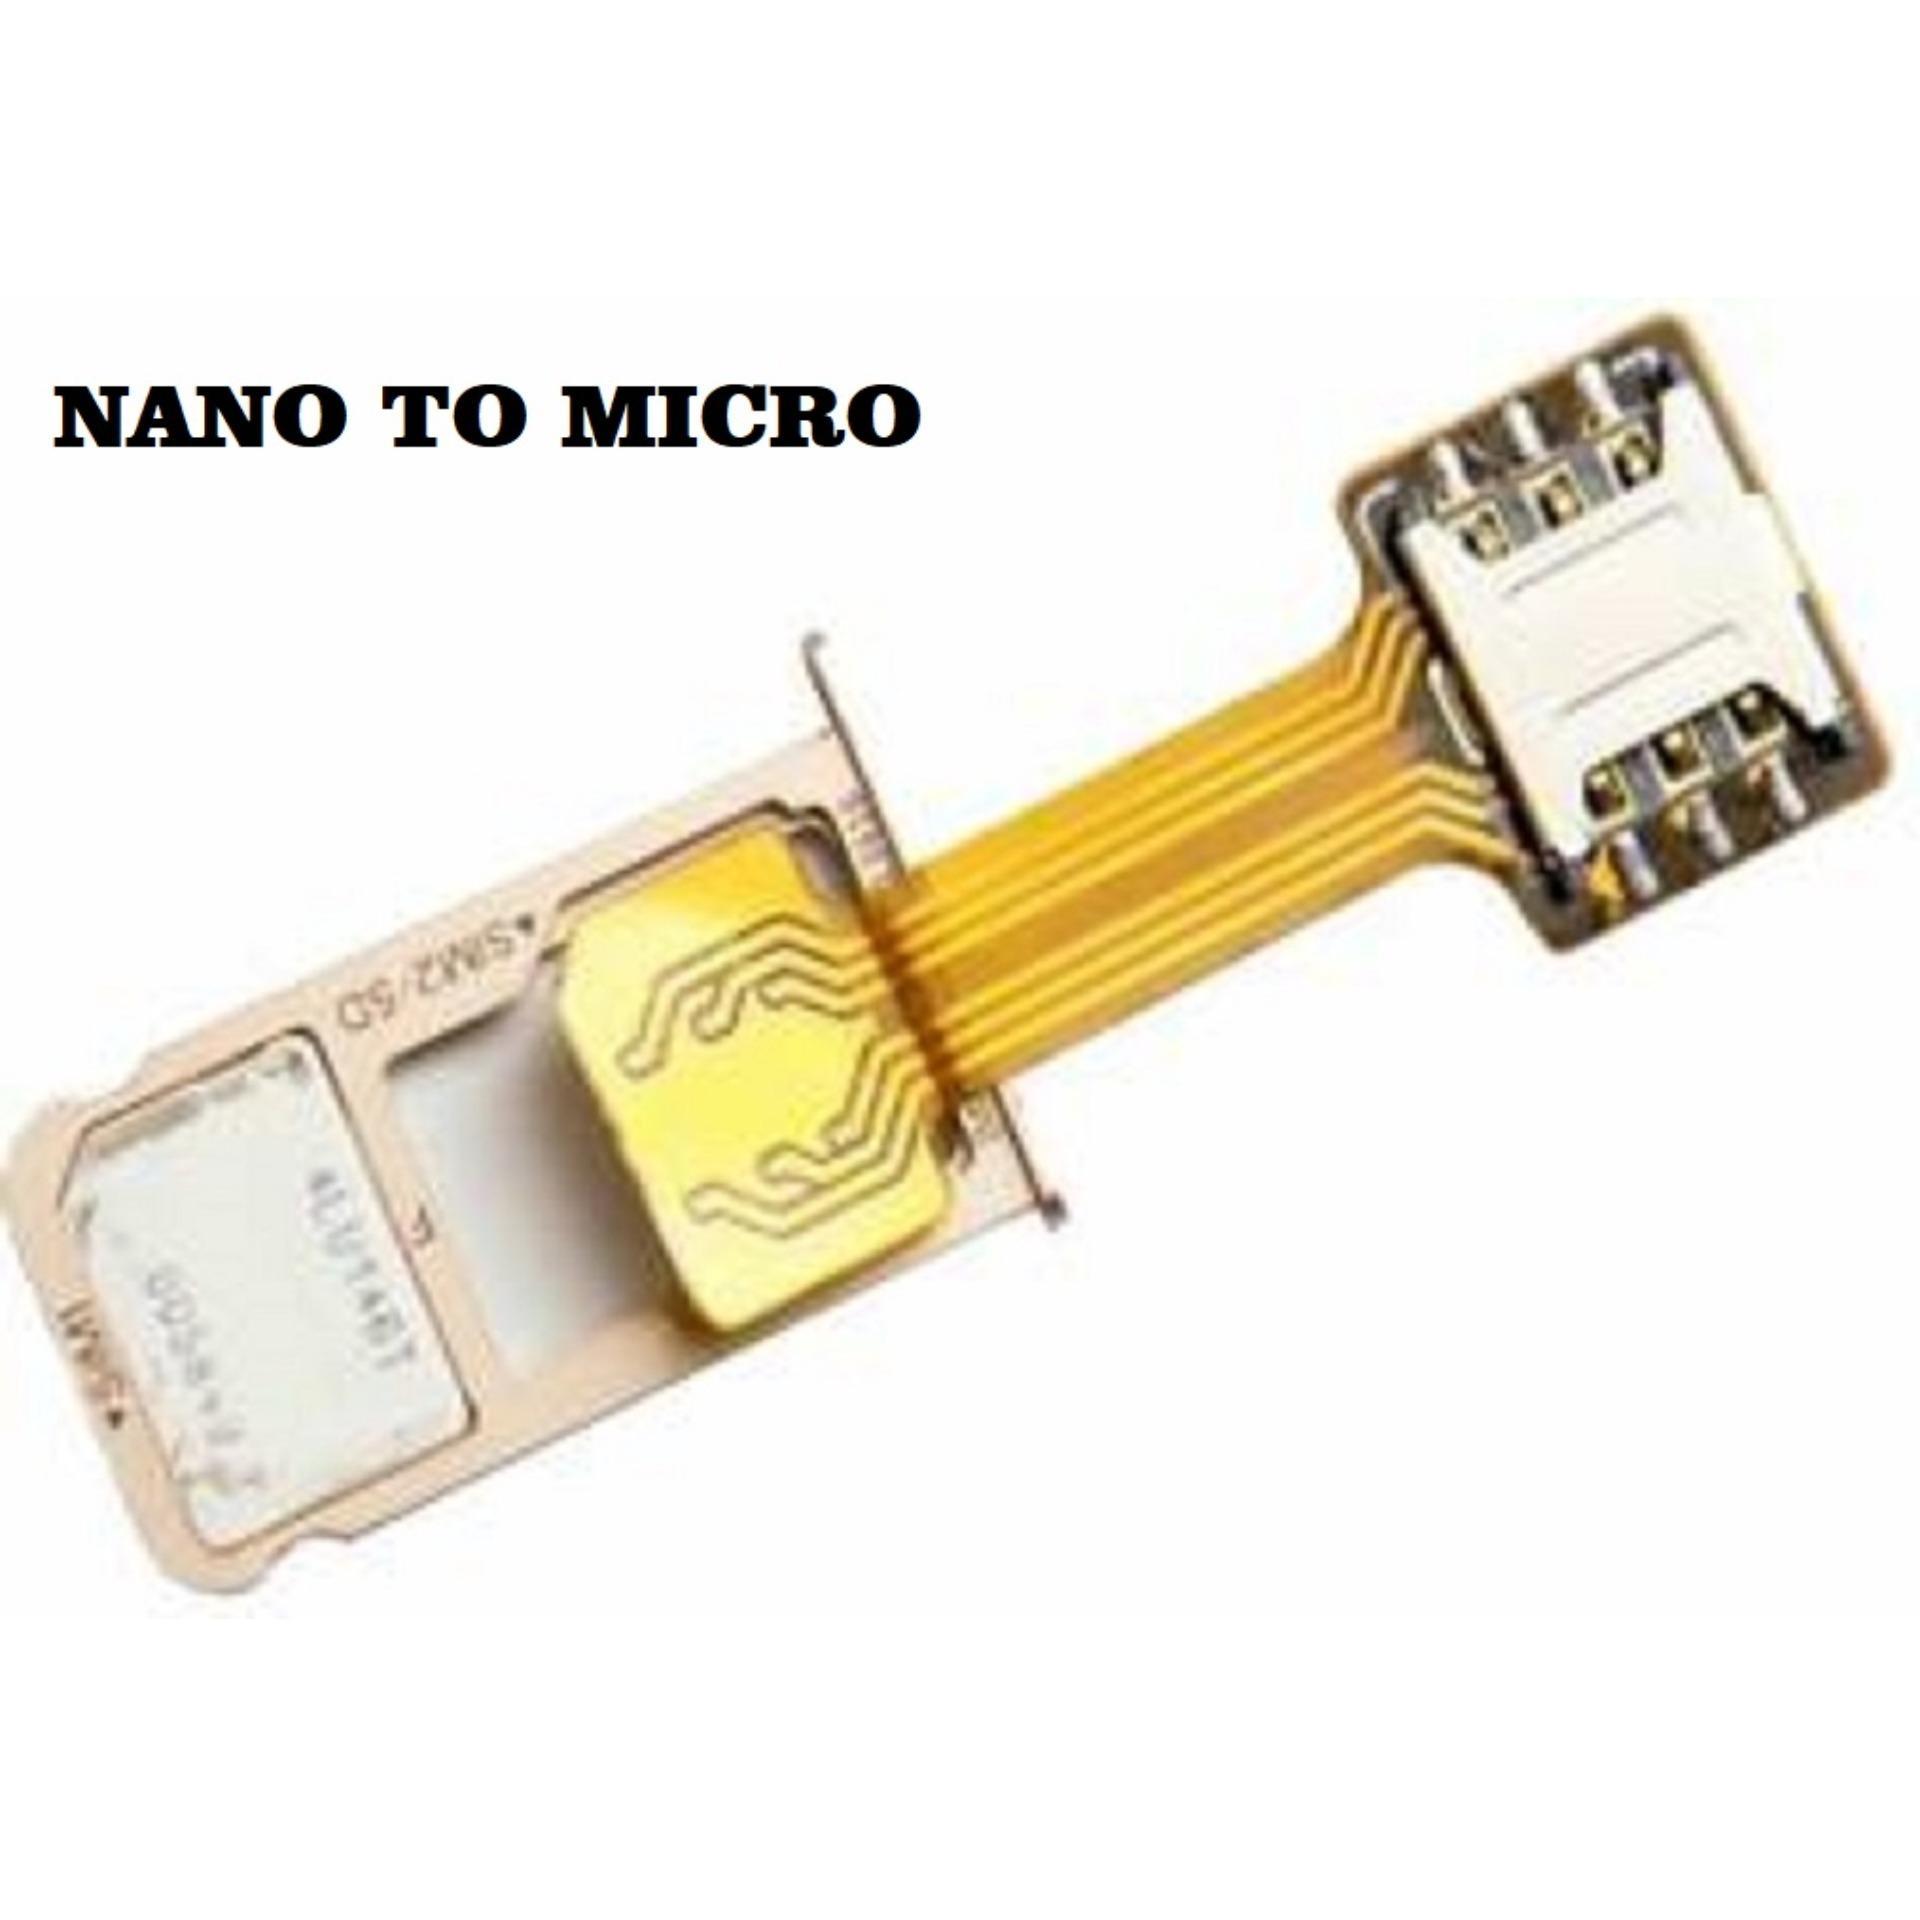 Dual Simcard Hybrid Extender Extension Micro SD Converter Adapter SIM Card for Oppo / Xioami Redmi / Samsung / Asus Zenfone / Meizu / Huawei - Nano To Micro